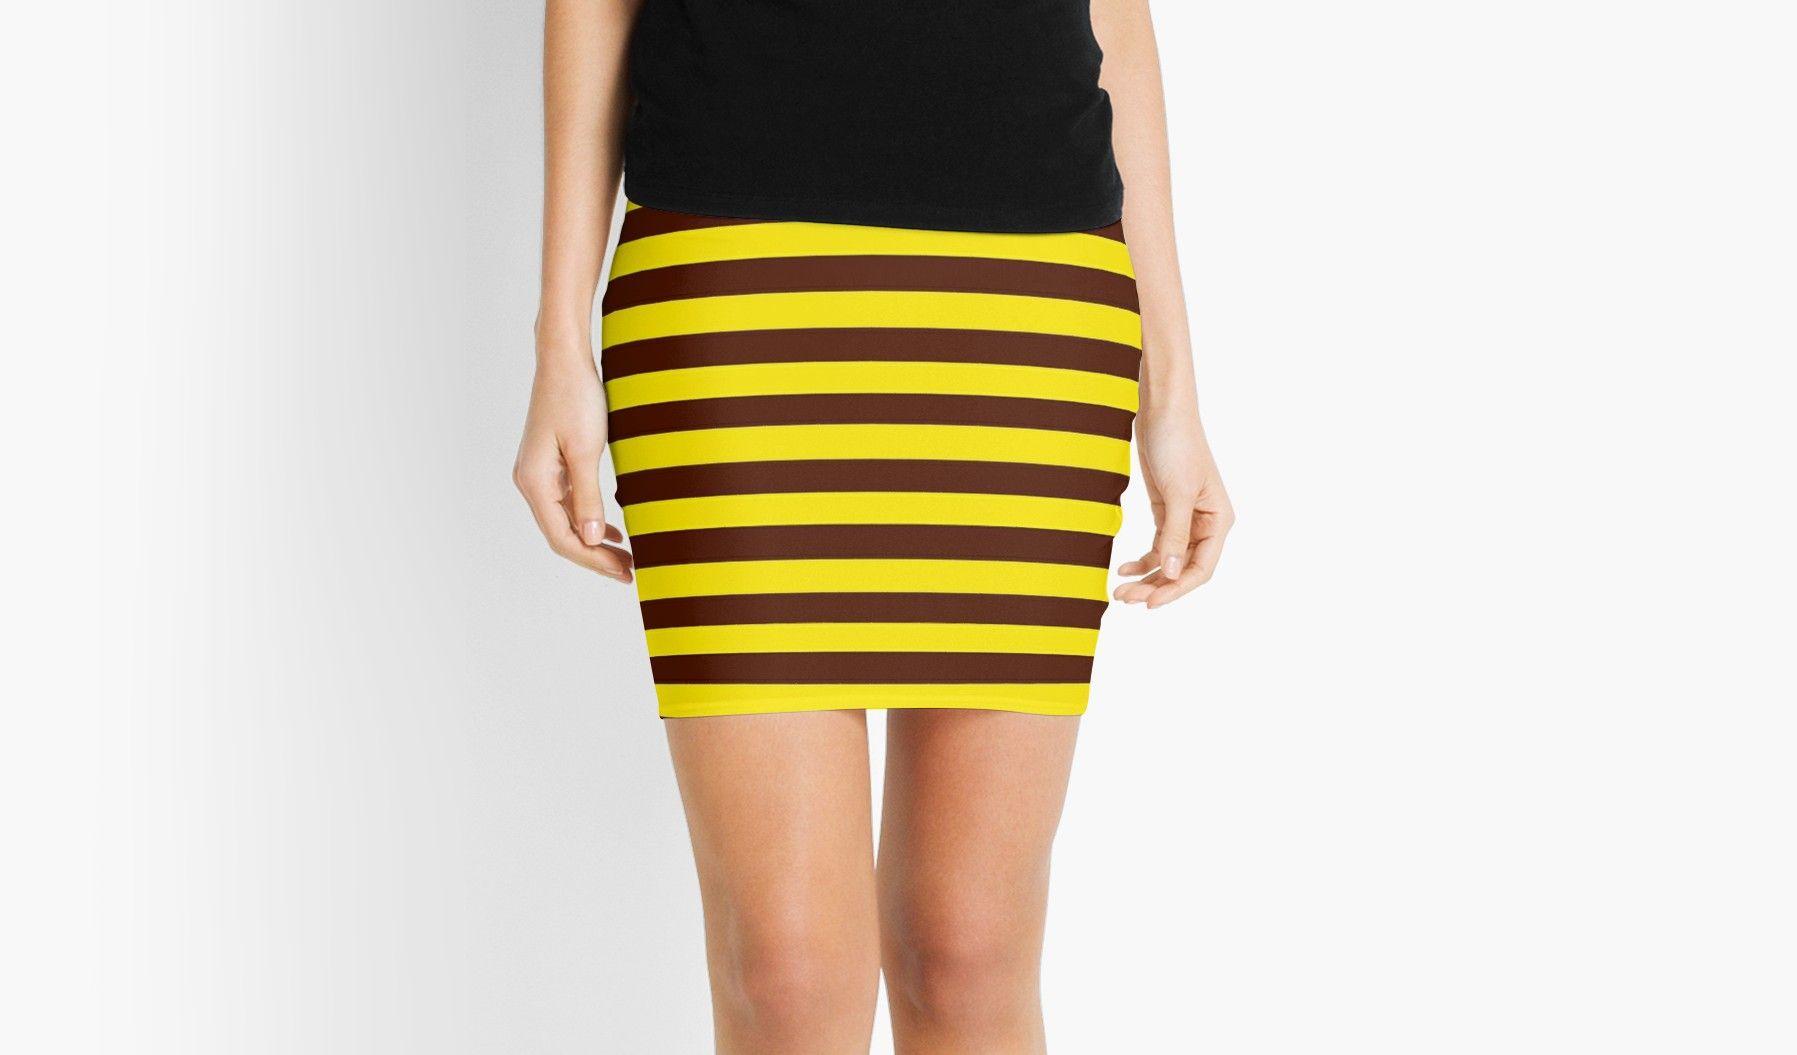 Pattern Striped Skirt Small